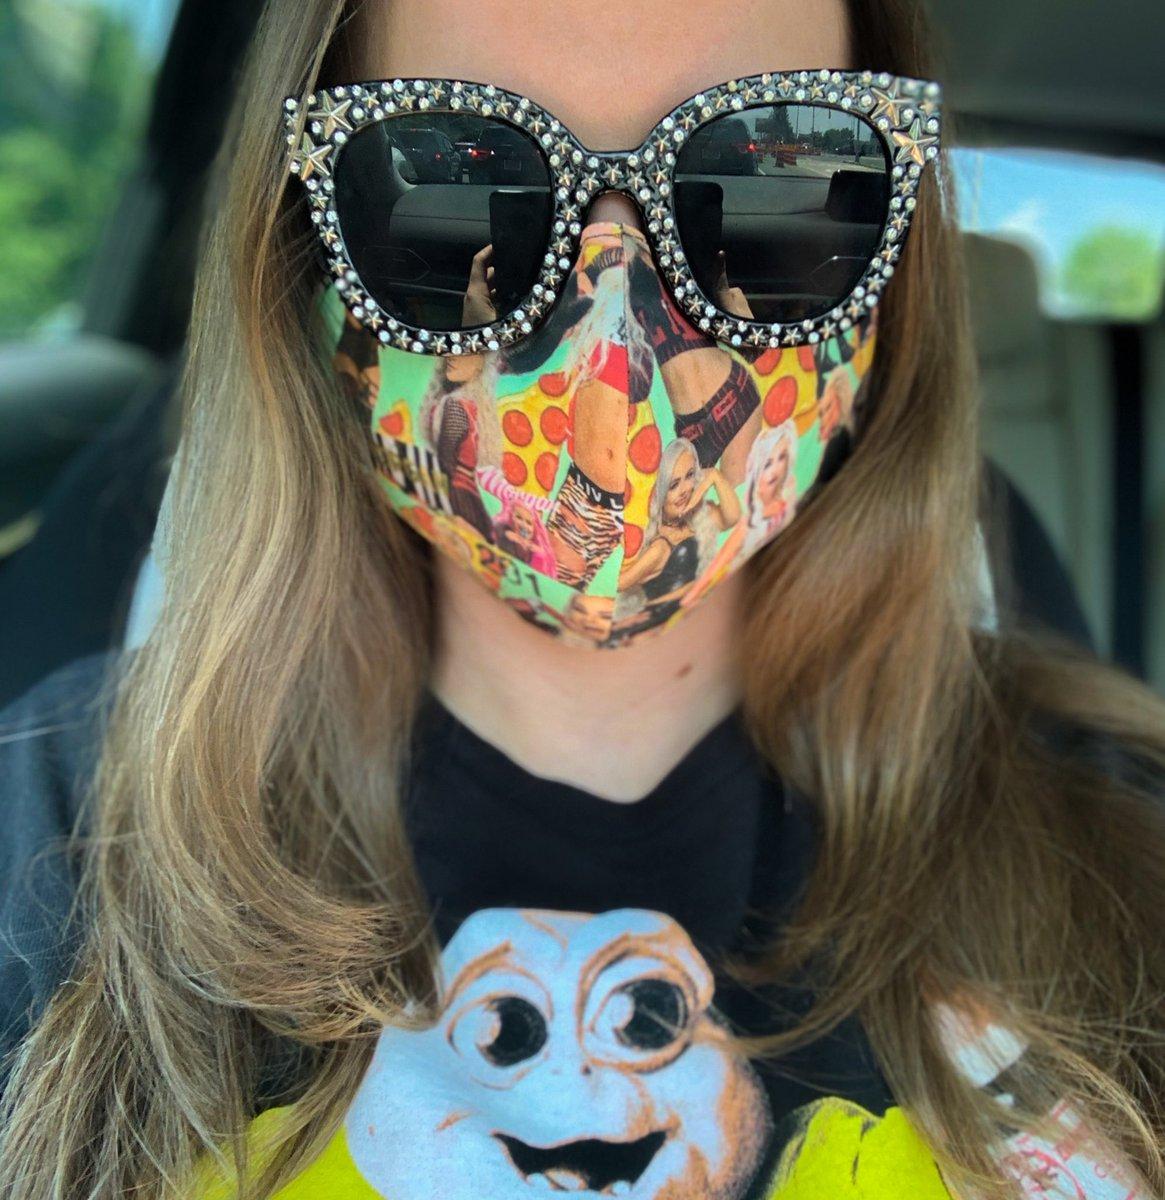 @YaOnlyLivvOnce WATCH ME wearing the best Facemask I've made 🍕 #LivandPizza https://t.co/9HmYv1K5dU